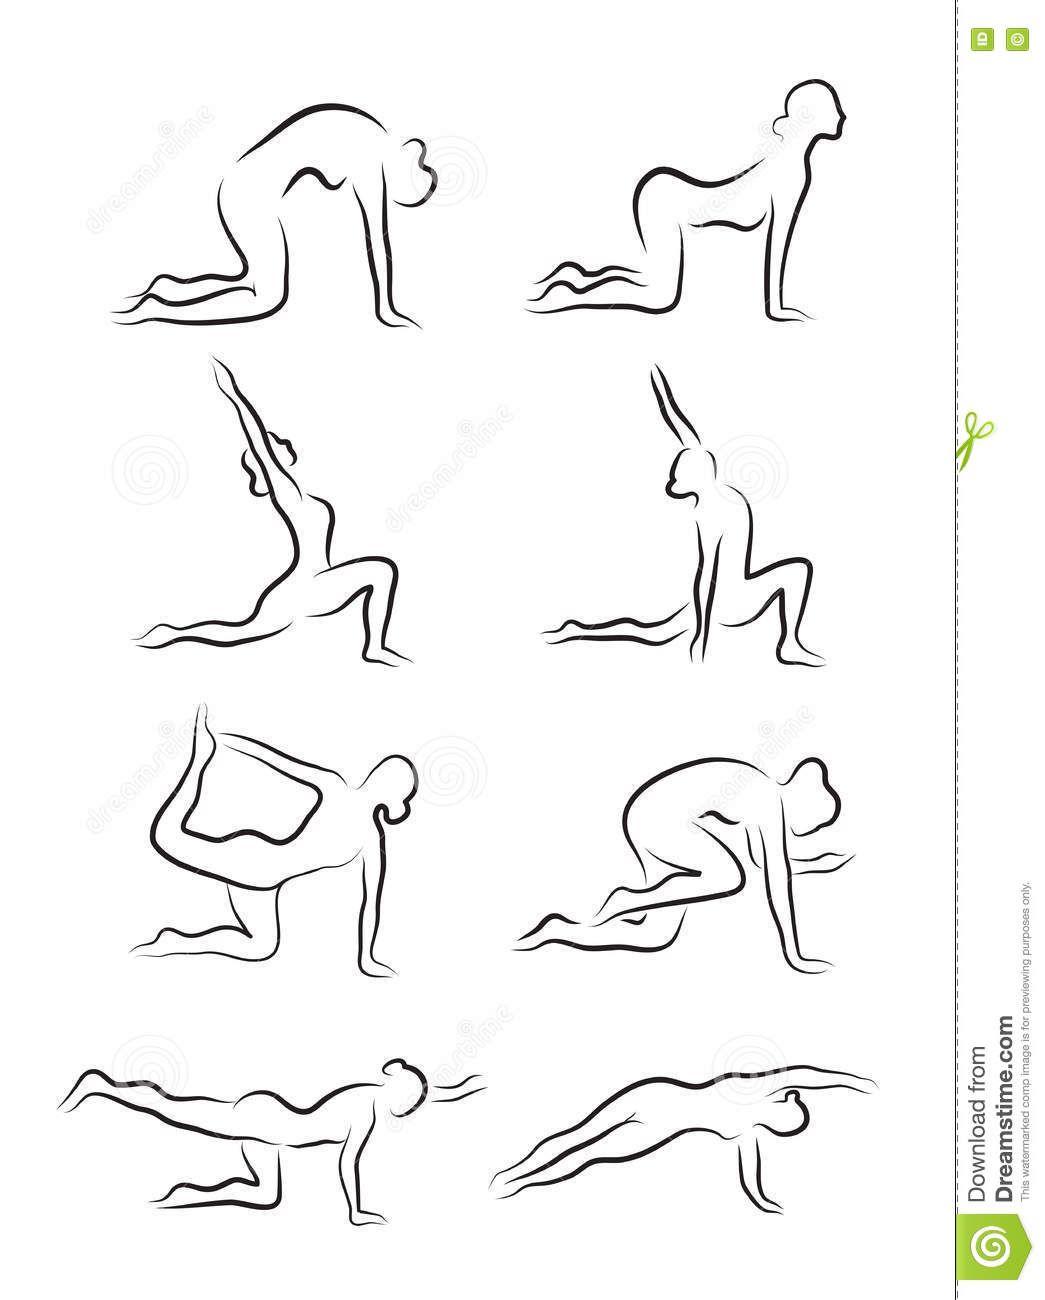 Pin By Dora Dora On Art Inspiration Sketches Yoga Asanas Vector Images